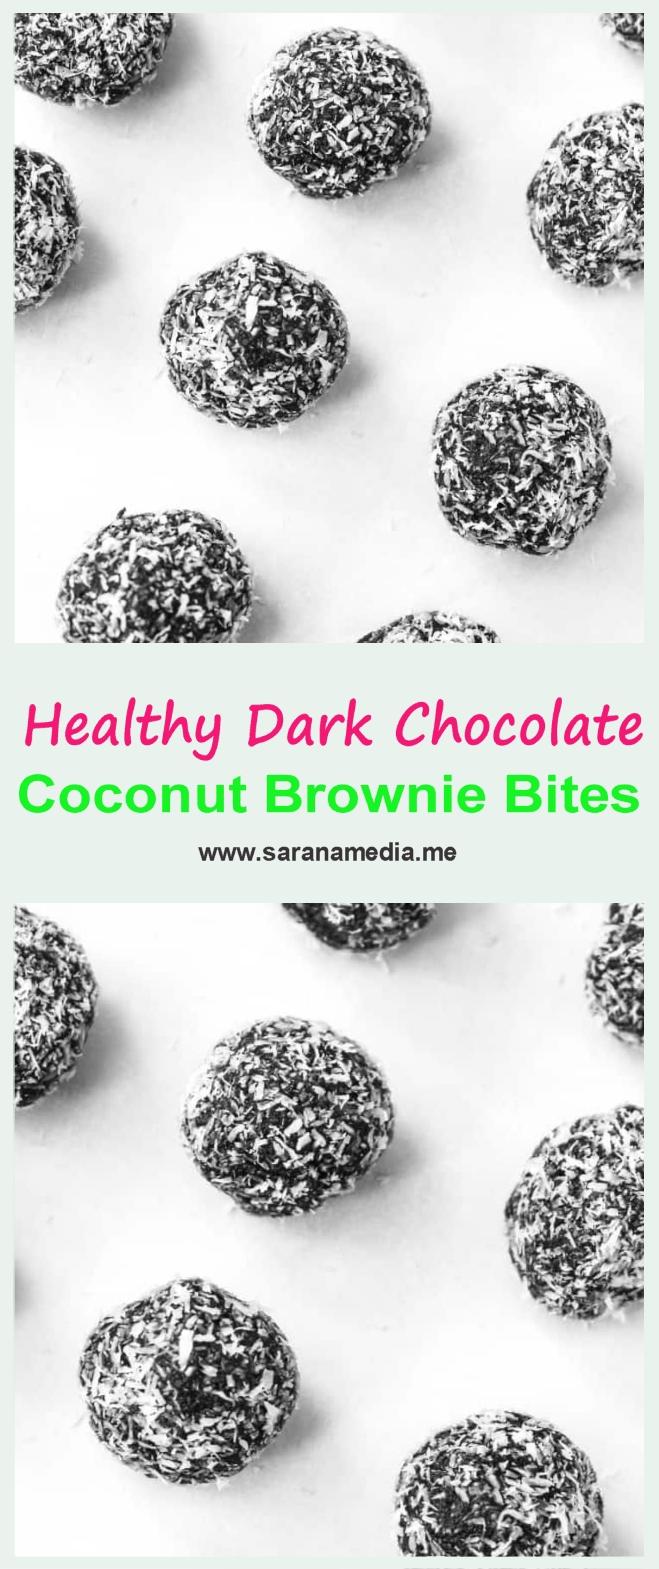 Healthy Dark Chocolate Coconut Brownie Bites